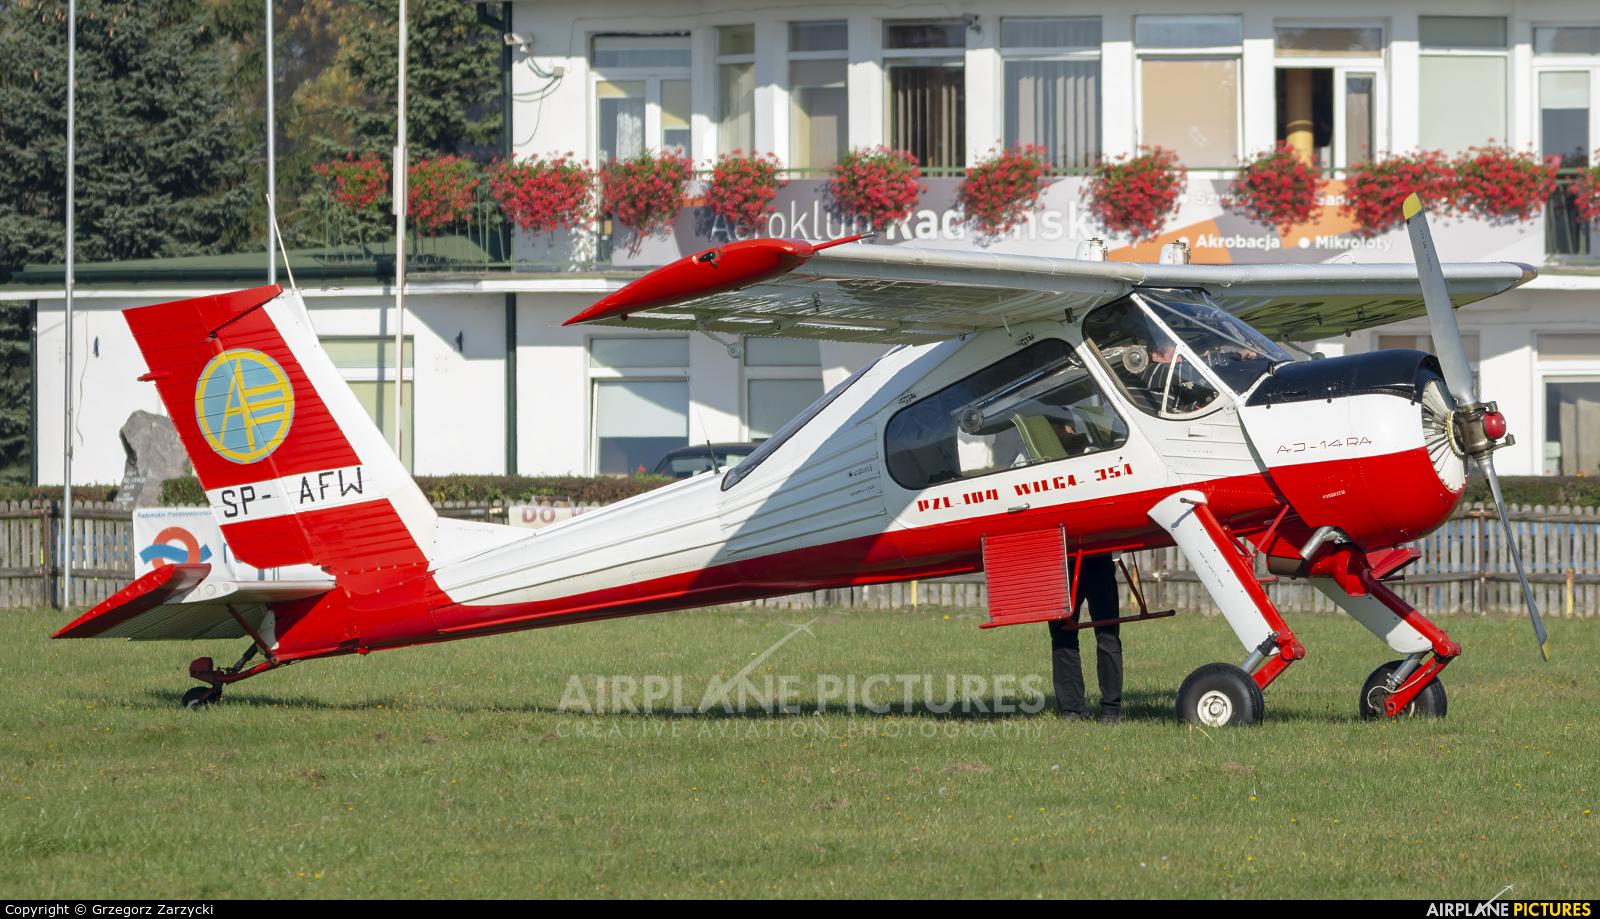 Aeroklub Polski SP-AFW aircraft at Radom - Piastów